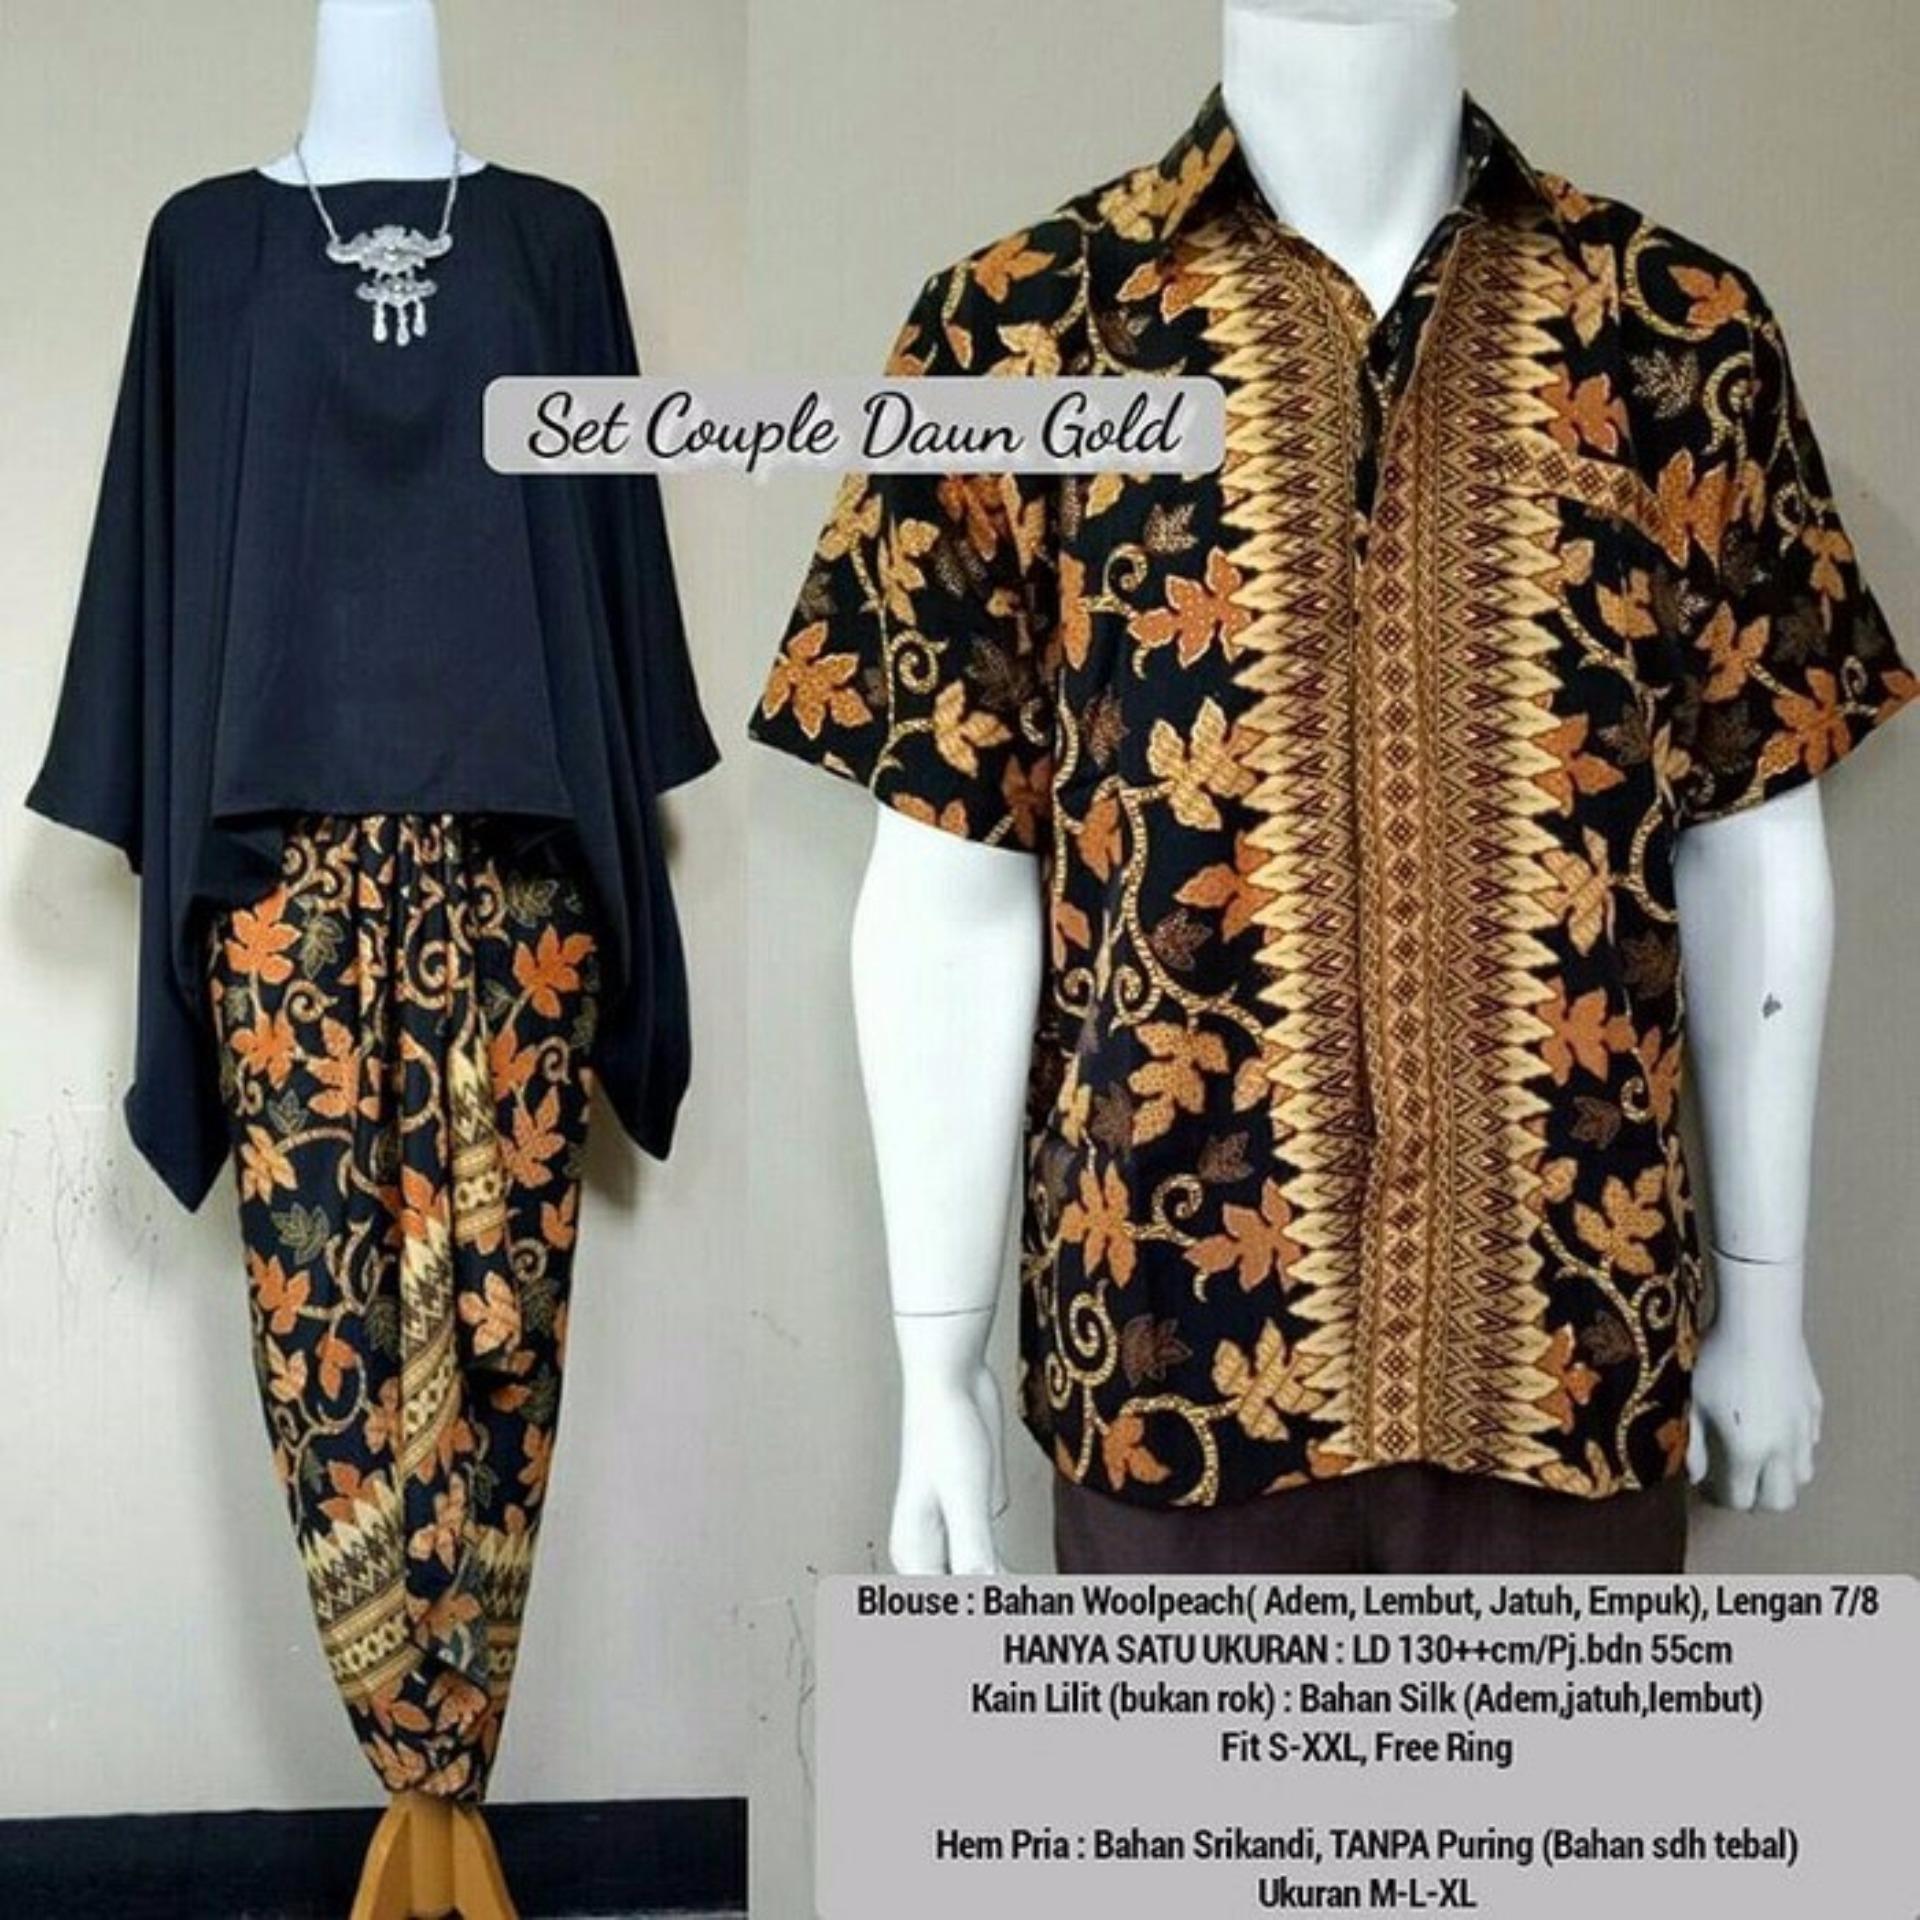 Stelan Atasan Blouse Black Batwing Dan Rok Lilit Batik Hitam Sartika Cj Collection Couple 3in1 Long Skirt Wanita